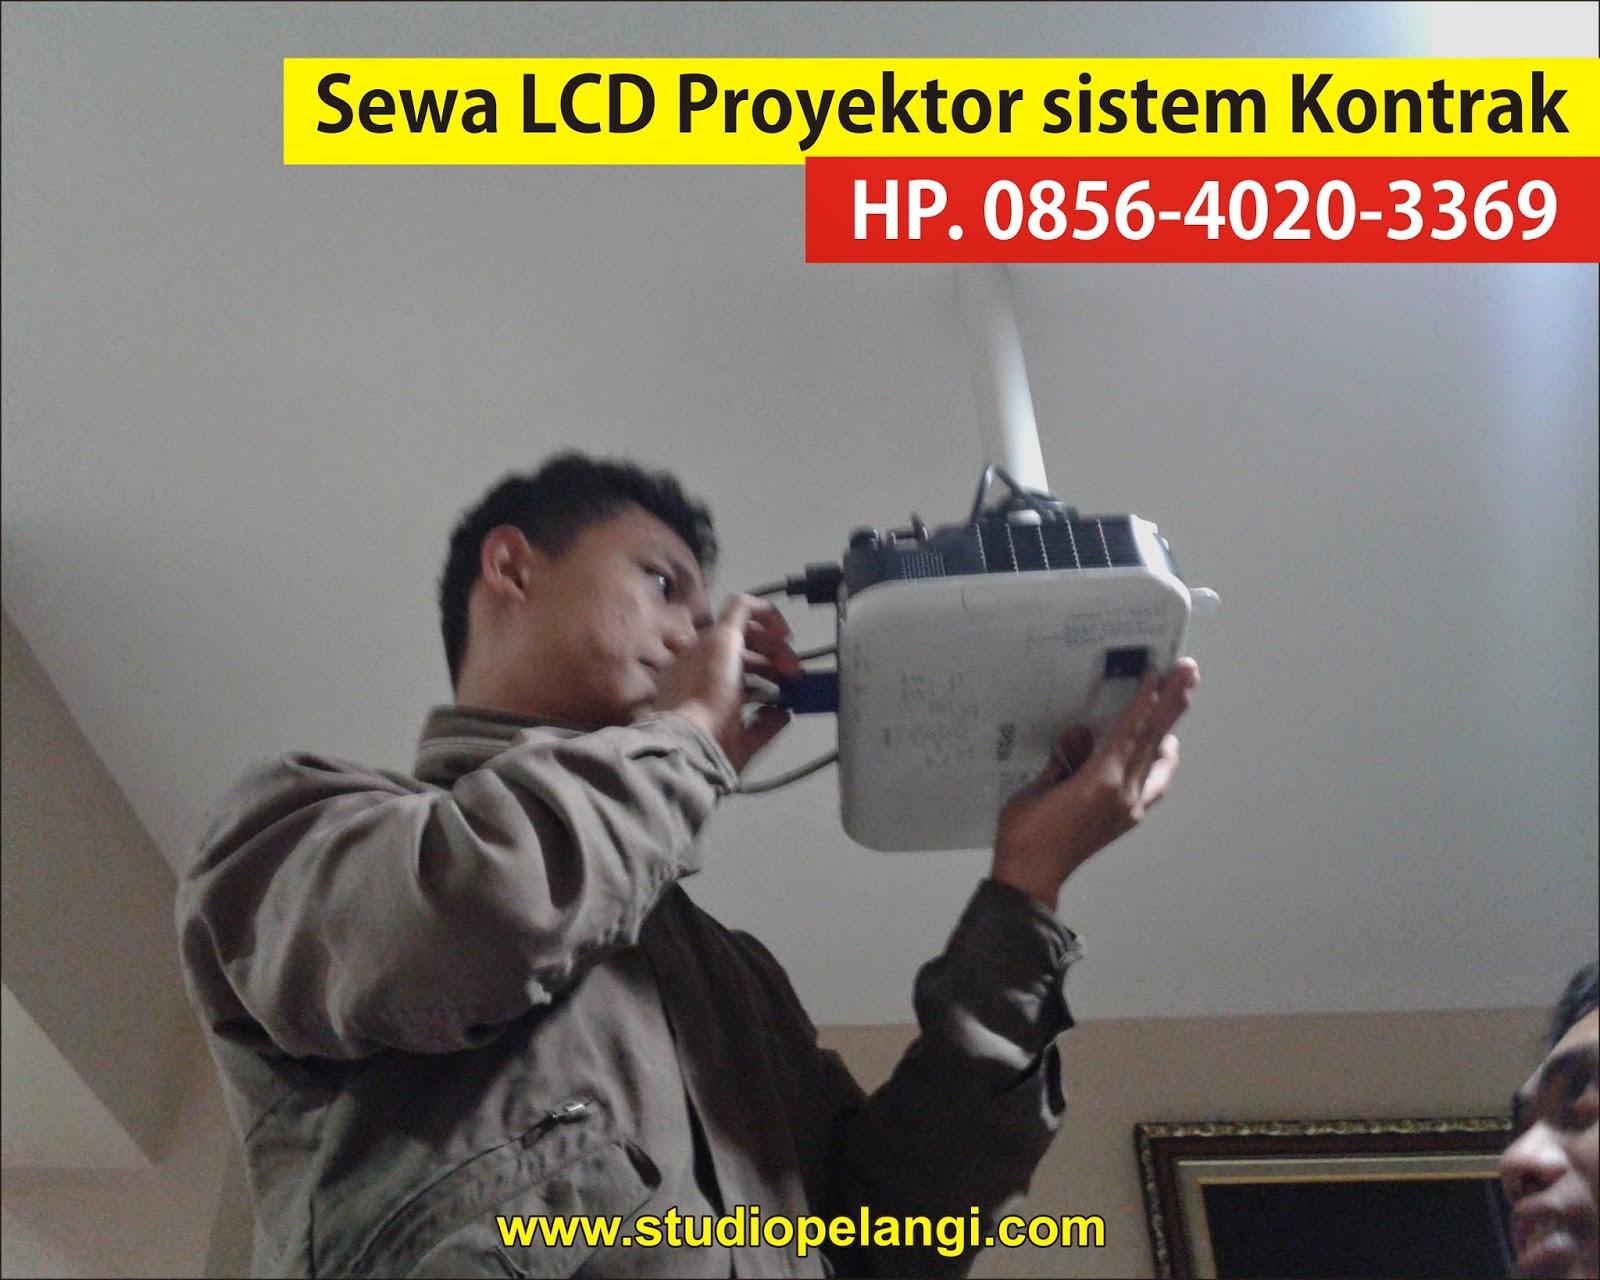 sewa lcd proyektor semarang